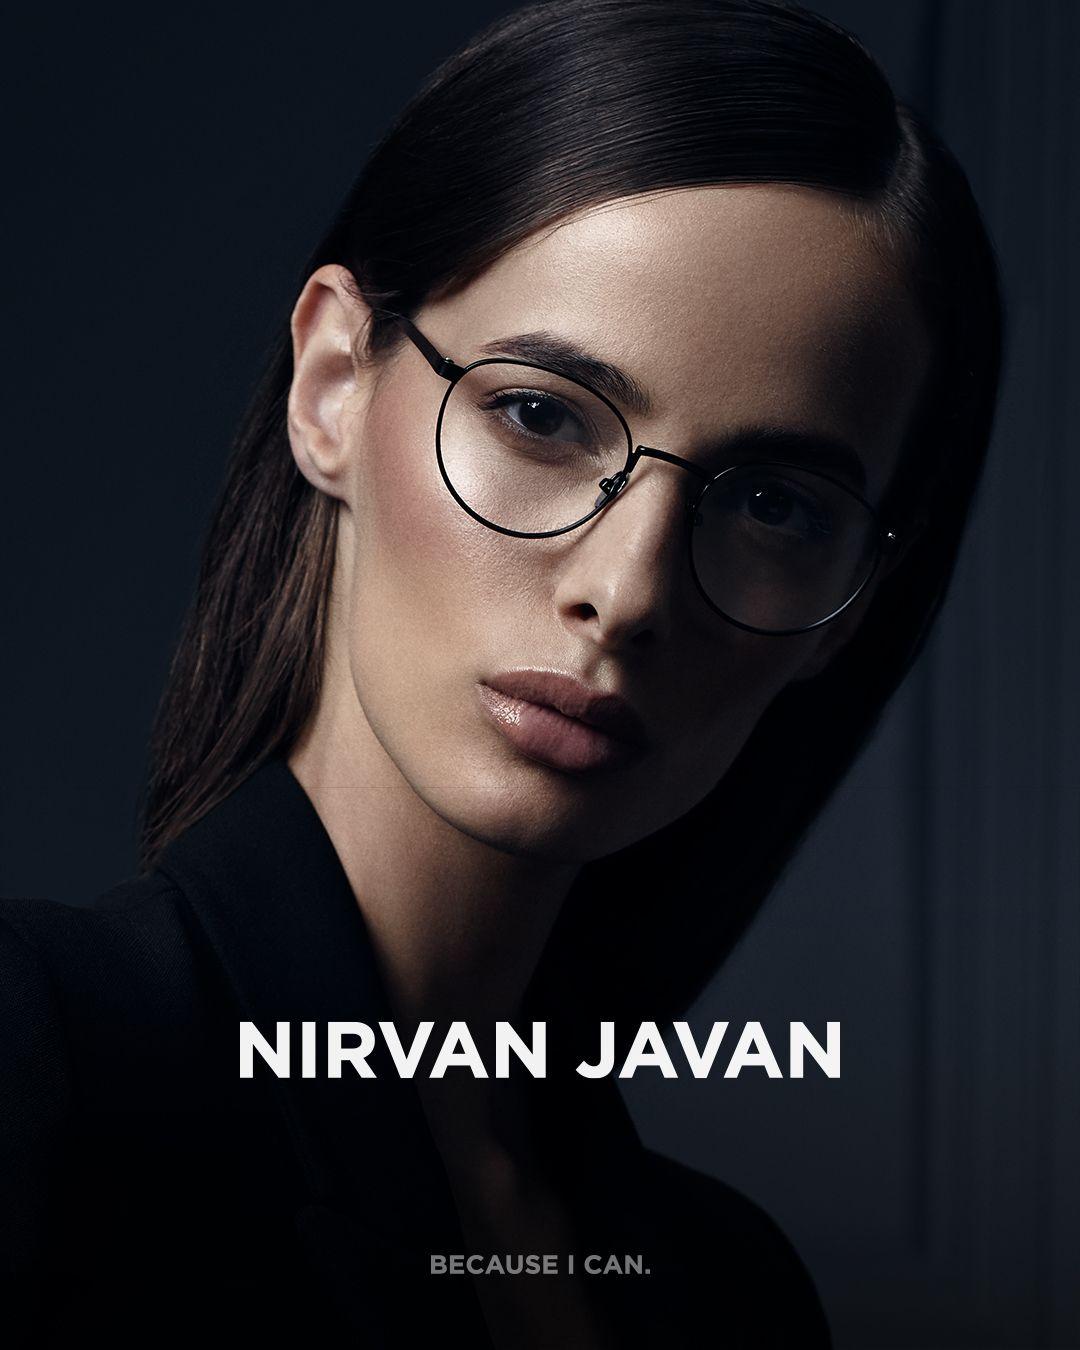 beste Auswahl an doppelter gutschein Luxusmode NIRVAN JAVAN - EYEWEAR #NIRVANJAVAN #EYEWEAR #WOMEN #GLASSES ...